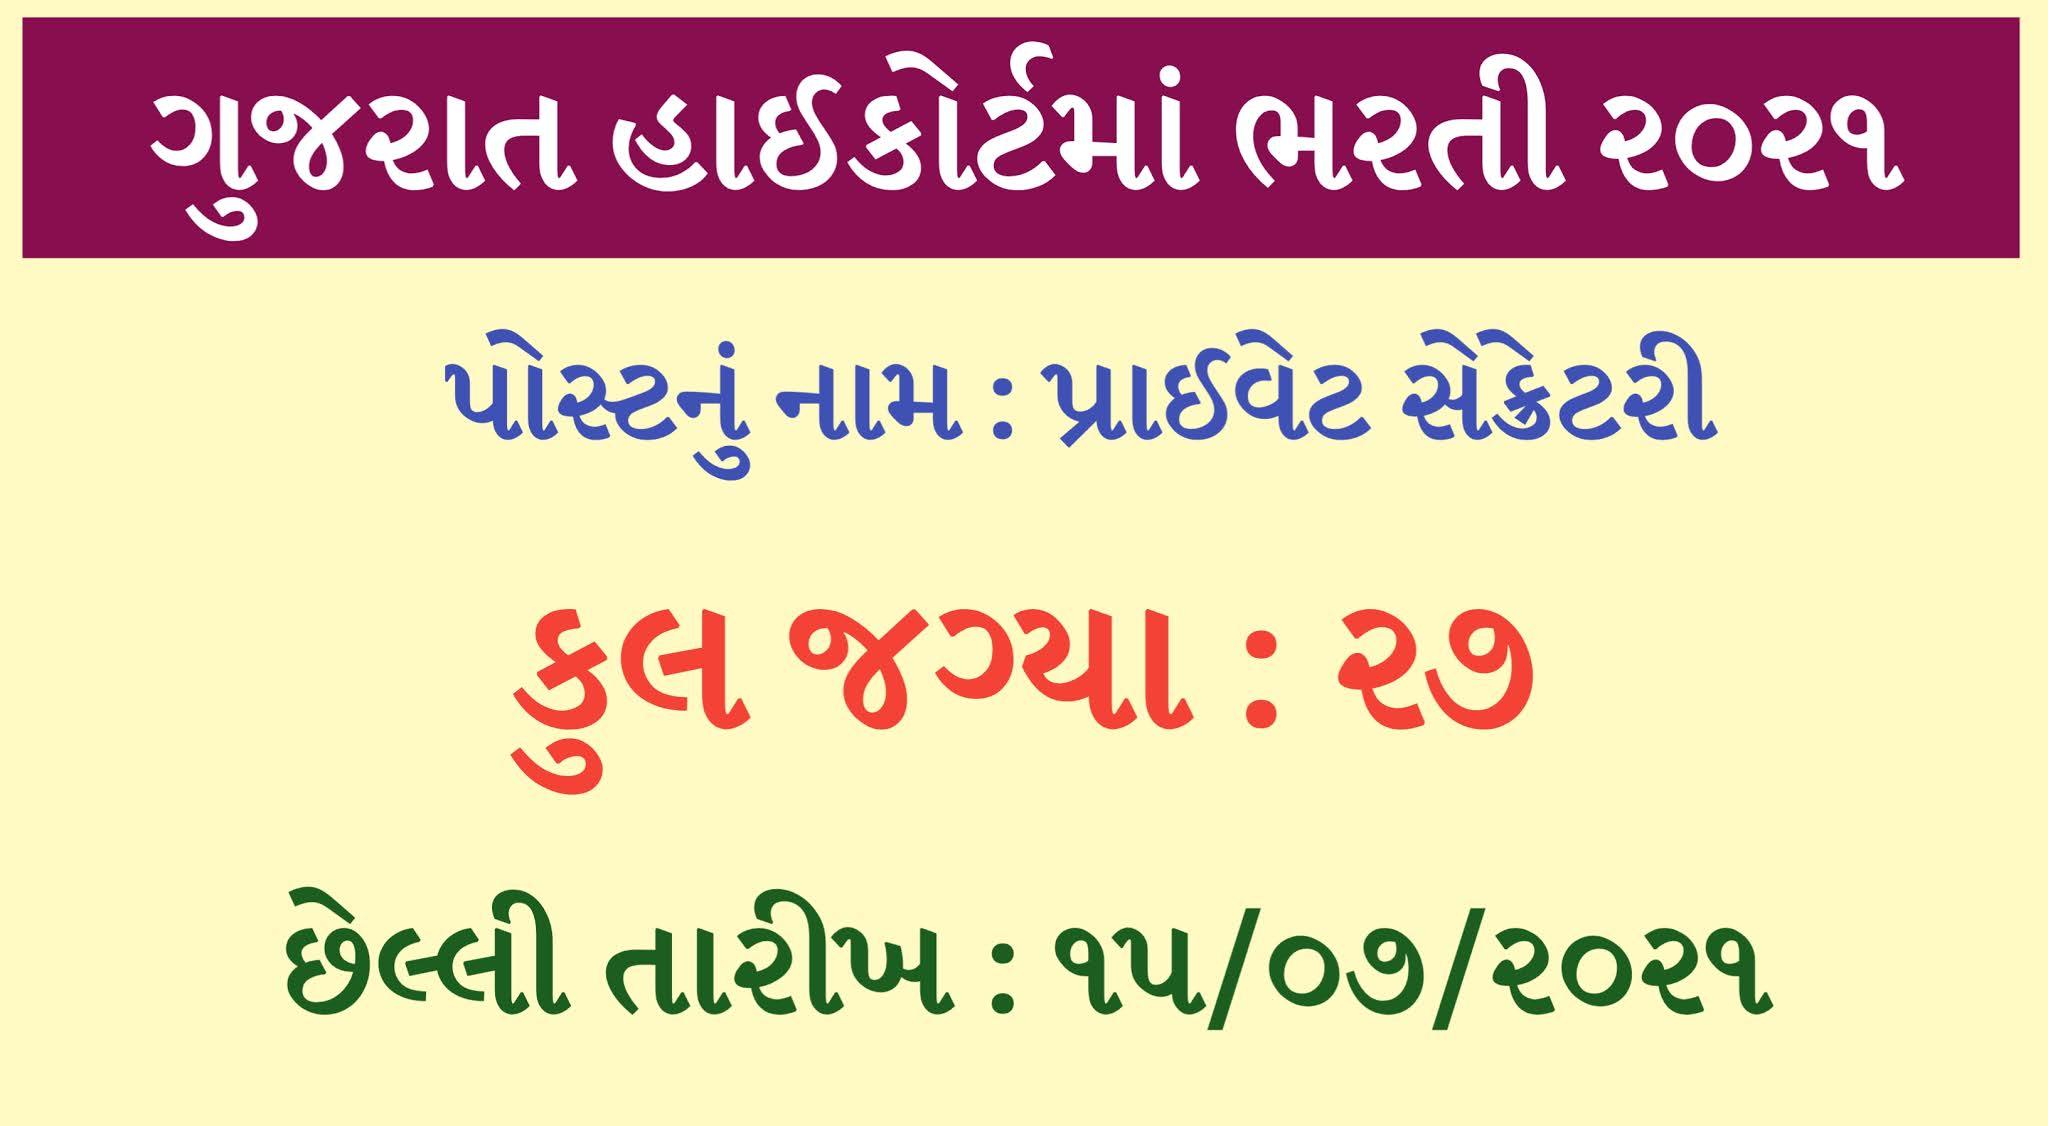 High Court of Gujarat Recruitment 2021   High Court Bharti 2021 Gujarat   High Court Recruitment 2021 Gujarat   Gujarat High Court Recruitment 2021   High Court of Gujarat Private Secretary Recruitment 2021   HC OJAS Portal   HC OJAS Gujarat   @hc-ojas.gujarat.gov.in